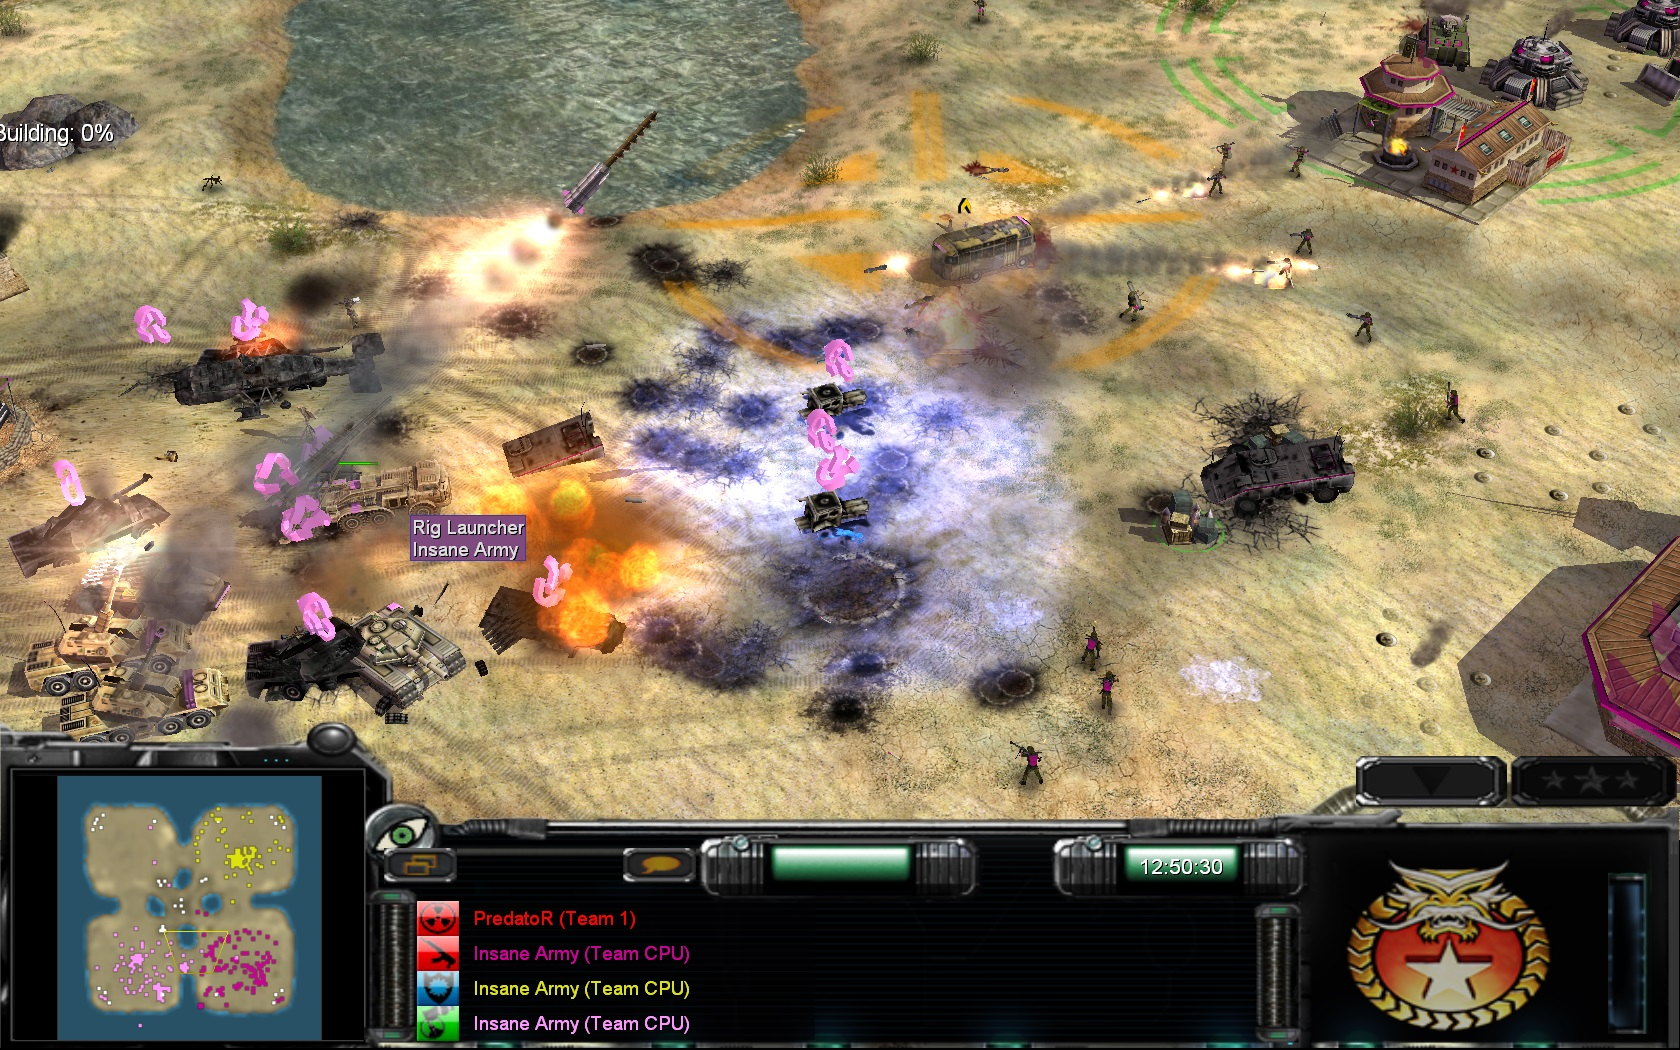 AI Rig Launcher